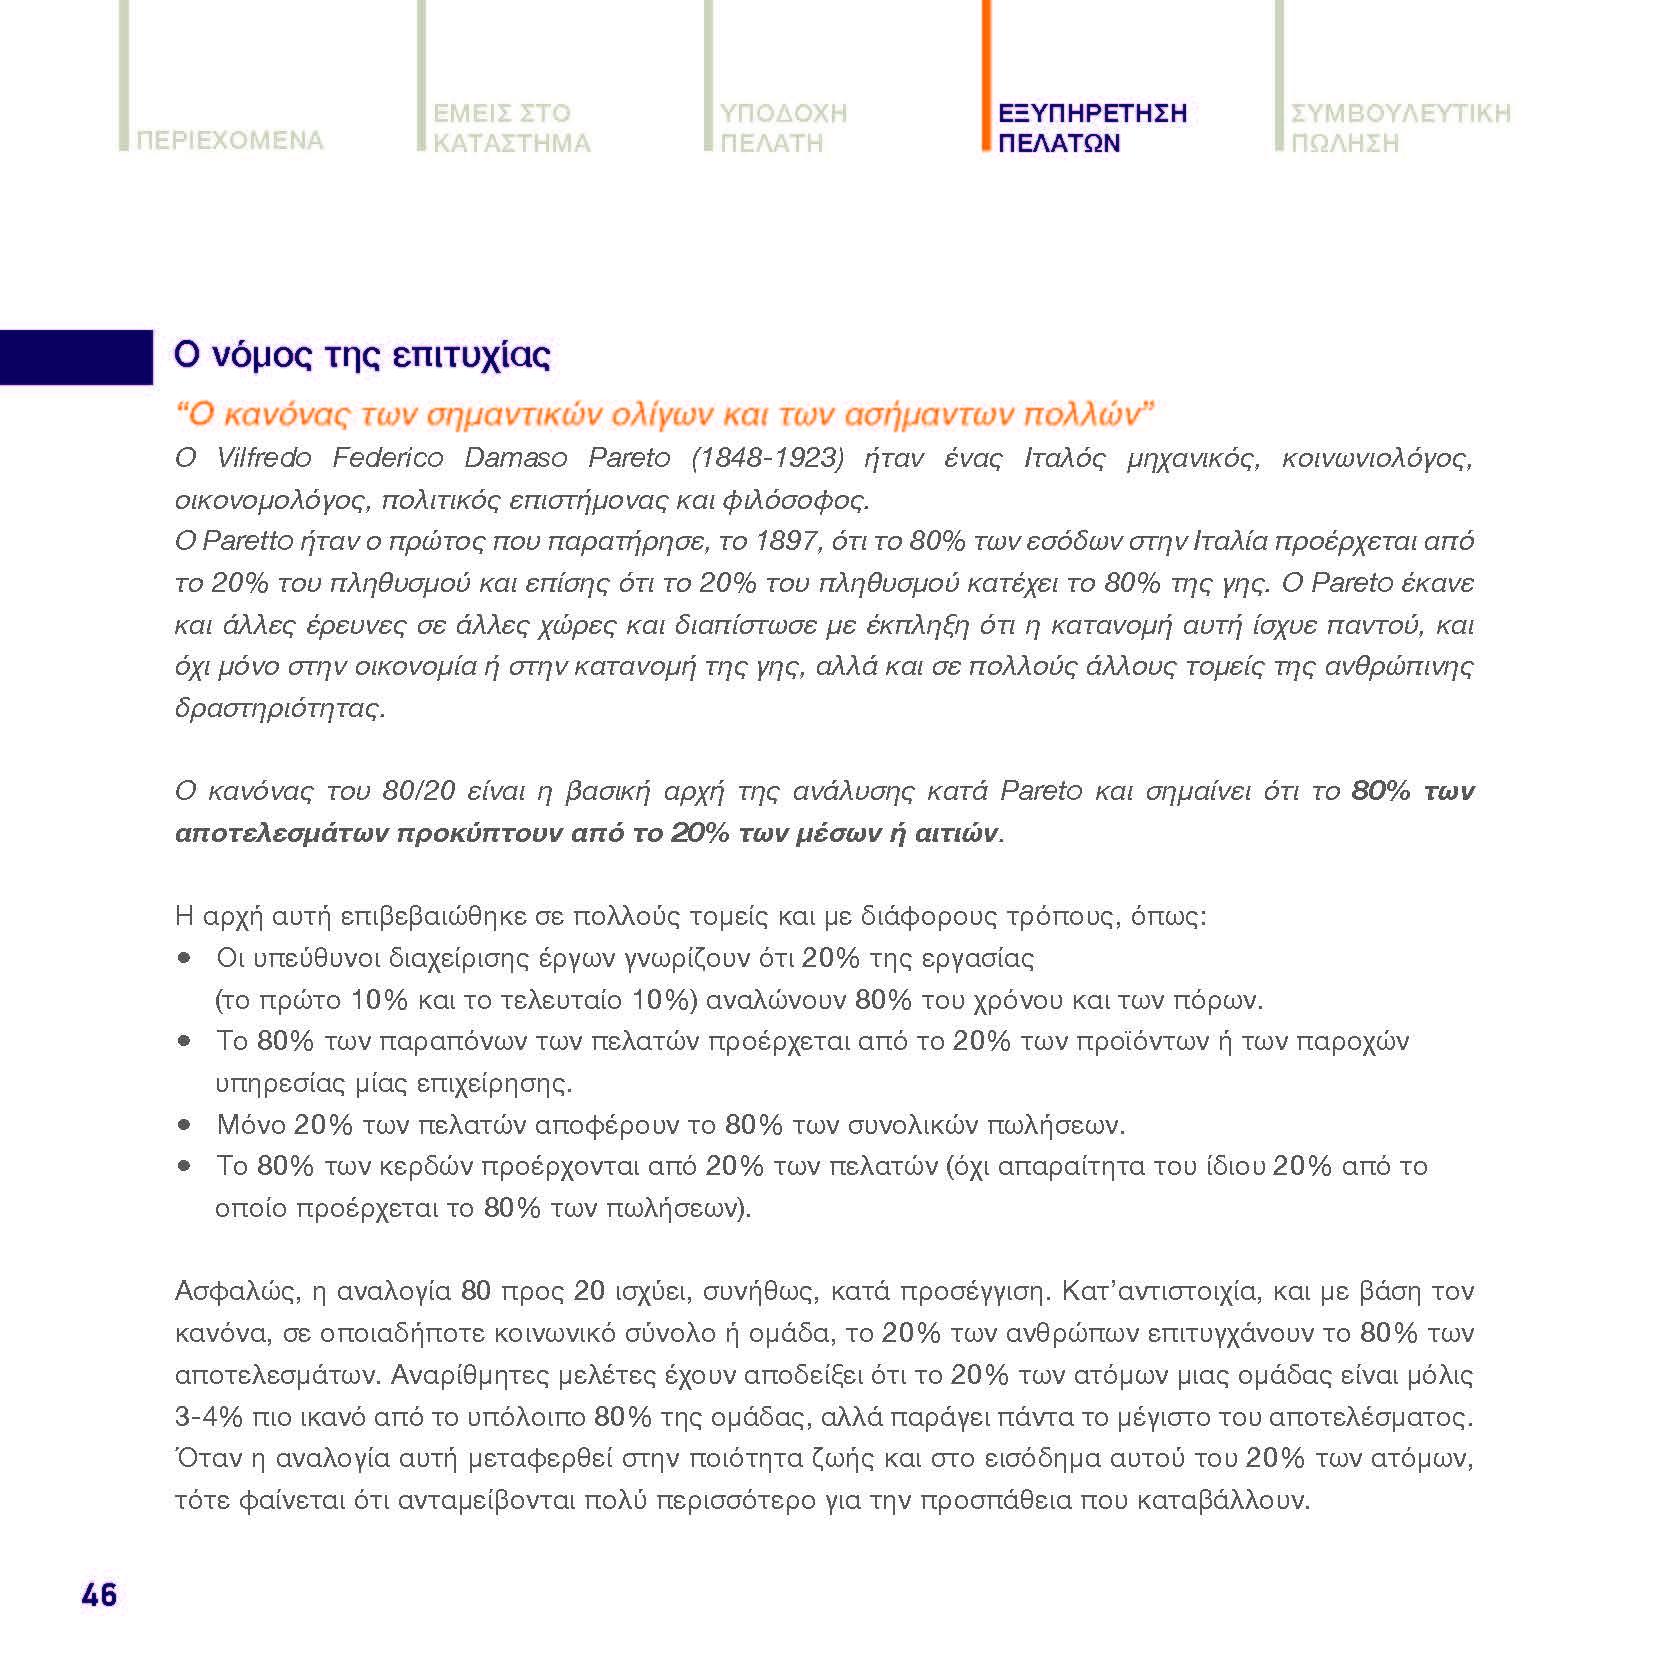 https://www.jib.gr/wp-content/uploads/2020/09/OPTIMA-BANK-BOOKLET-WEB_Page_046.jpg